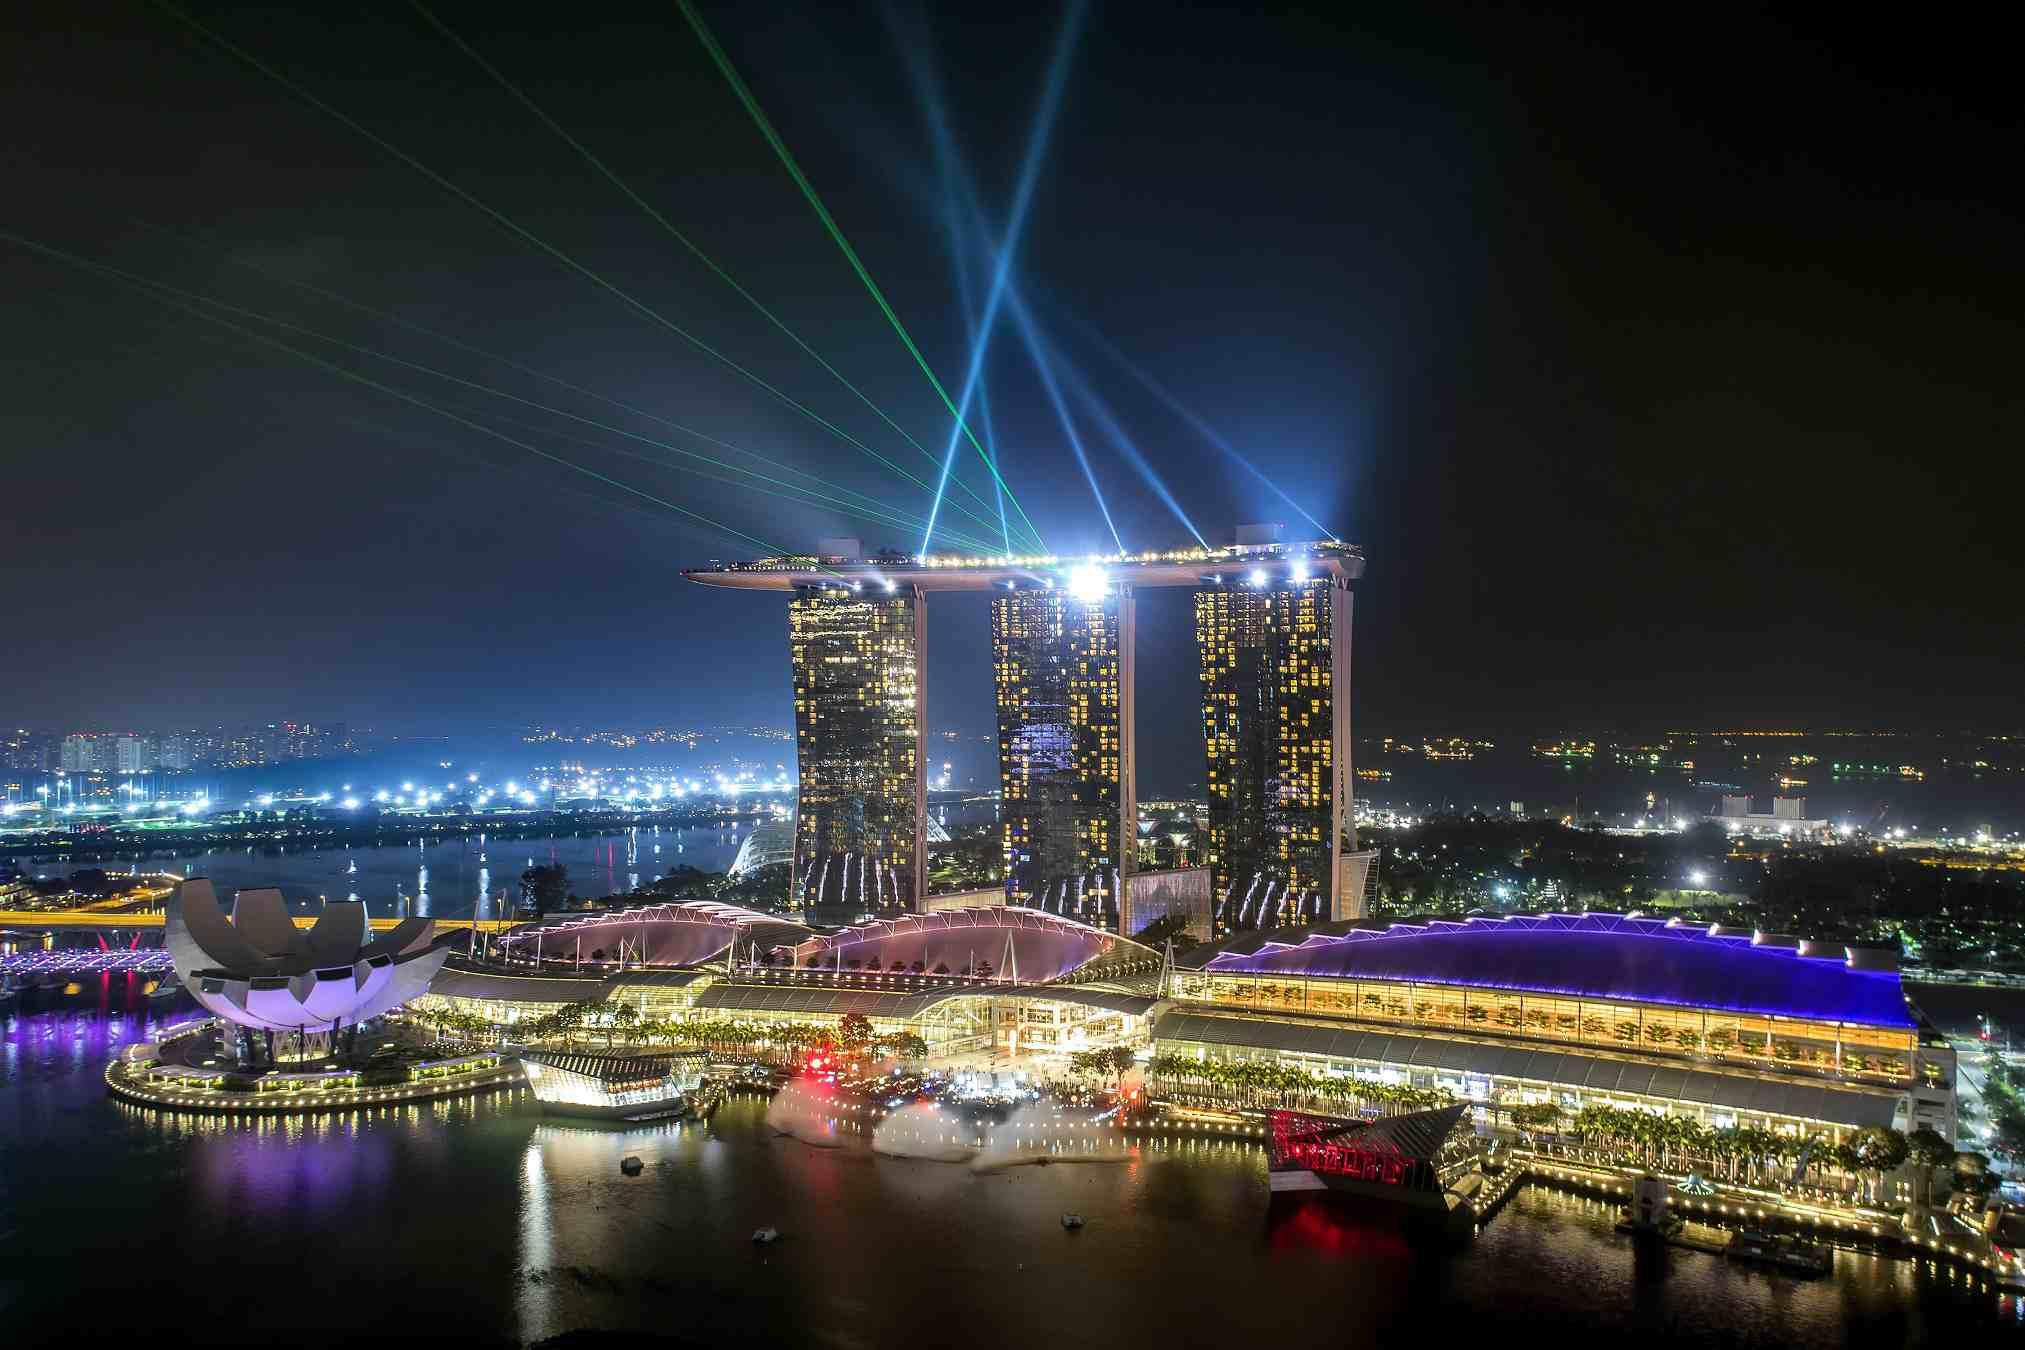 Light show at Marina Bay, Singapore